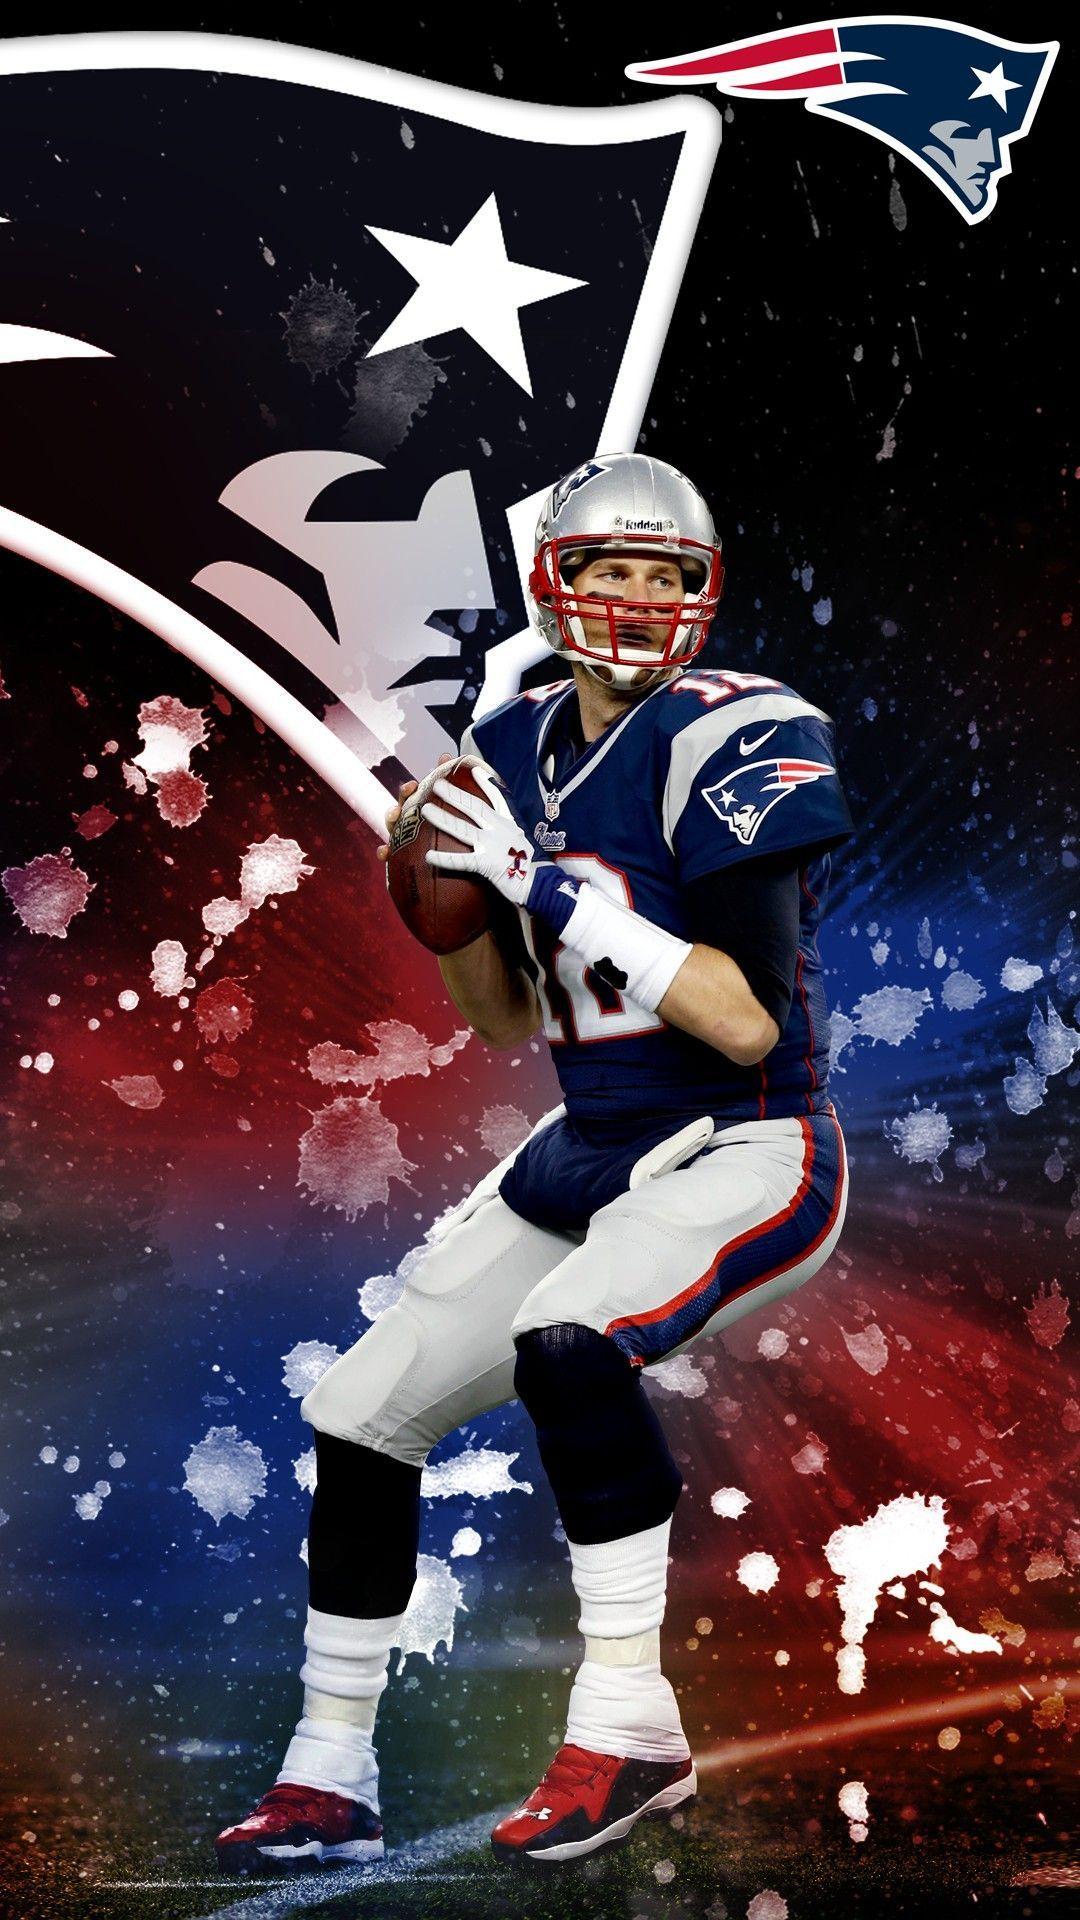 Tom Brady iPhone 7 Plus Wallpaper | Best NFL Wallpapers #nflfootballseason